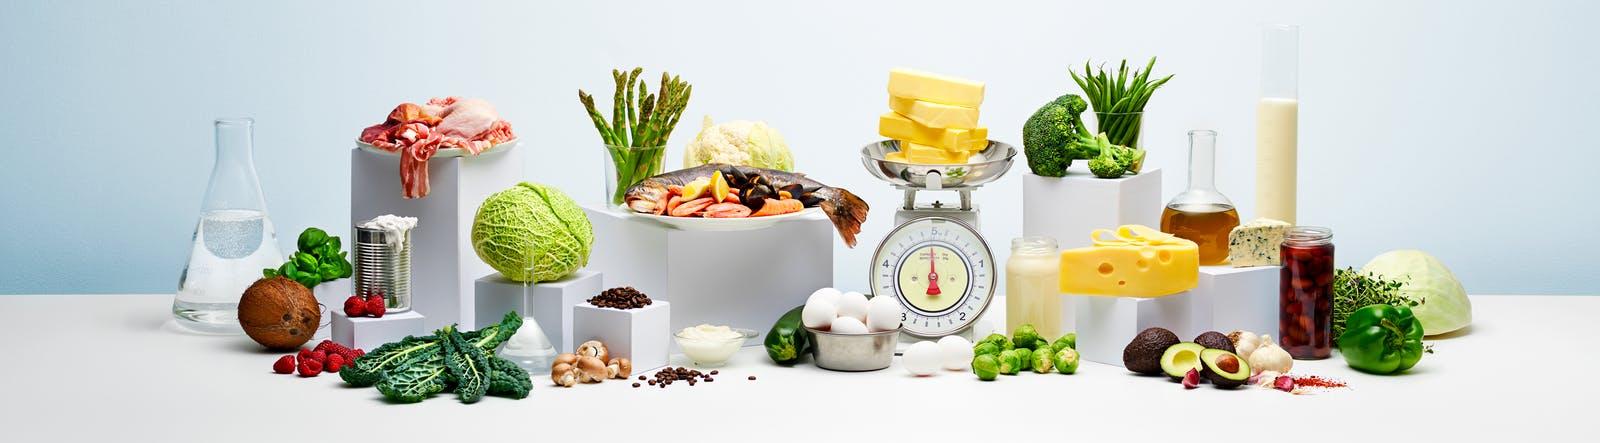 Keto diet linked to increased Type-2 Diabetes risk in mice